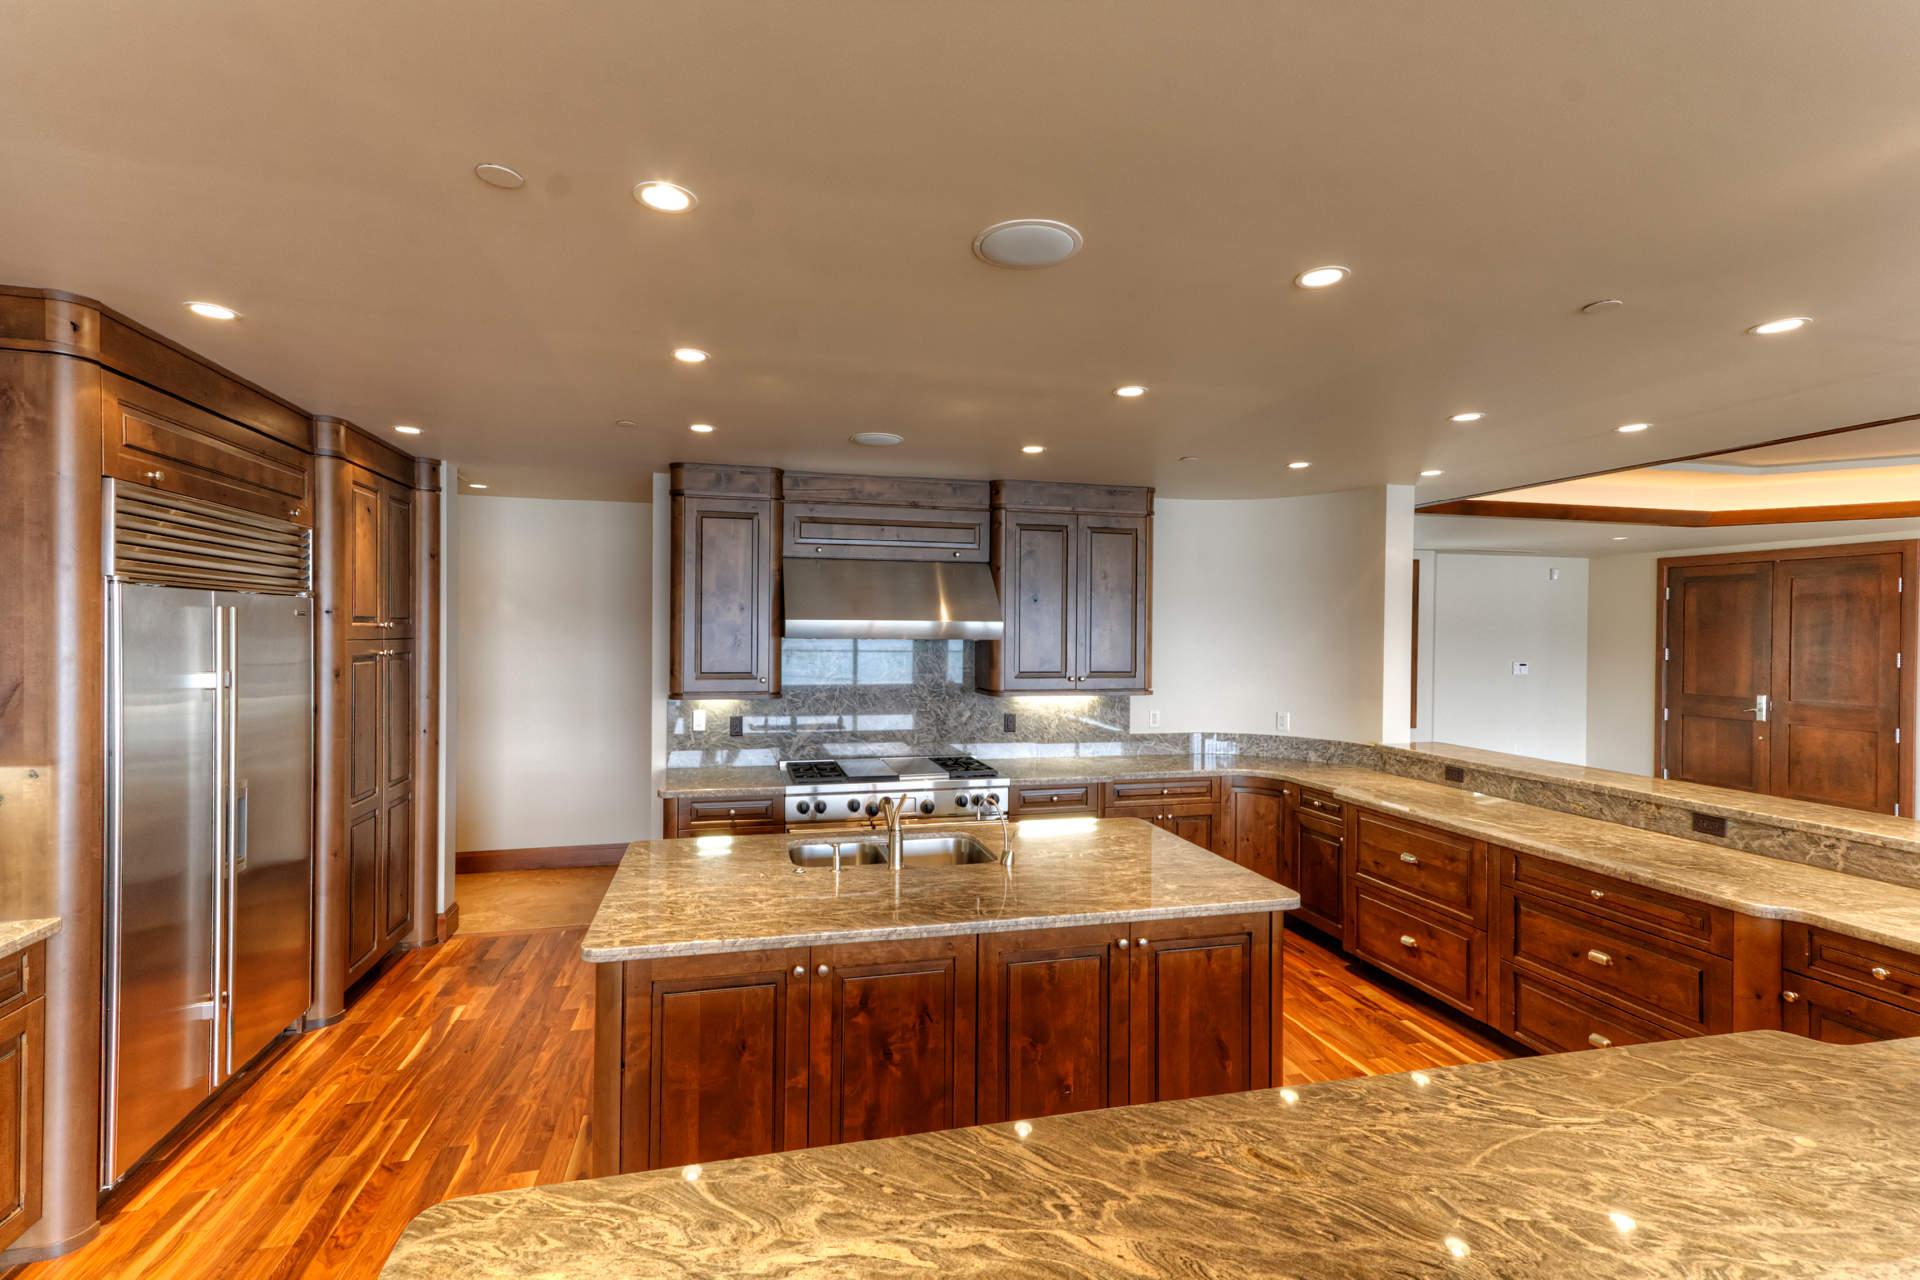 european kitchen cabinet hardware sconces worlds best condos the terraces lake coeur d'alene idaho